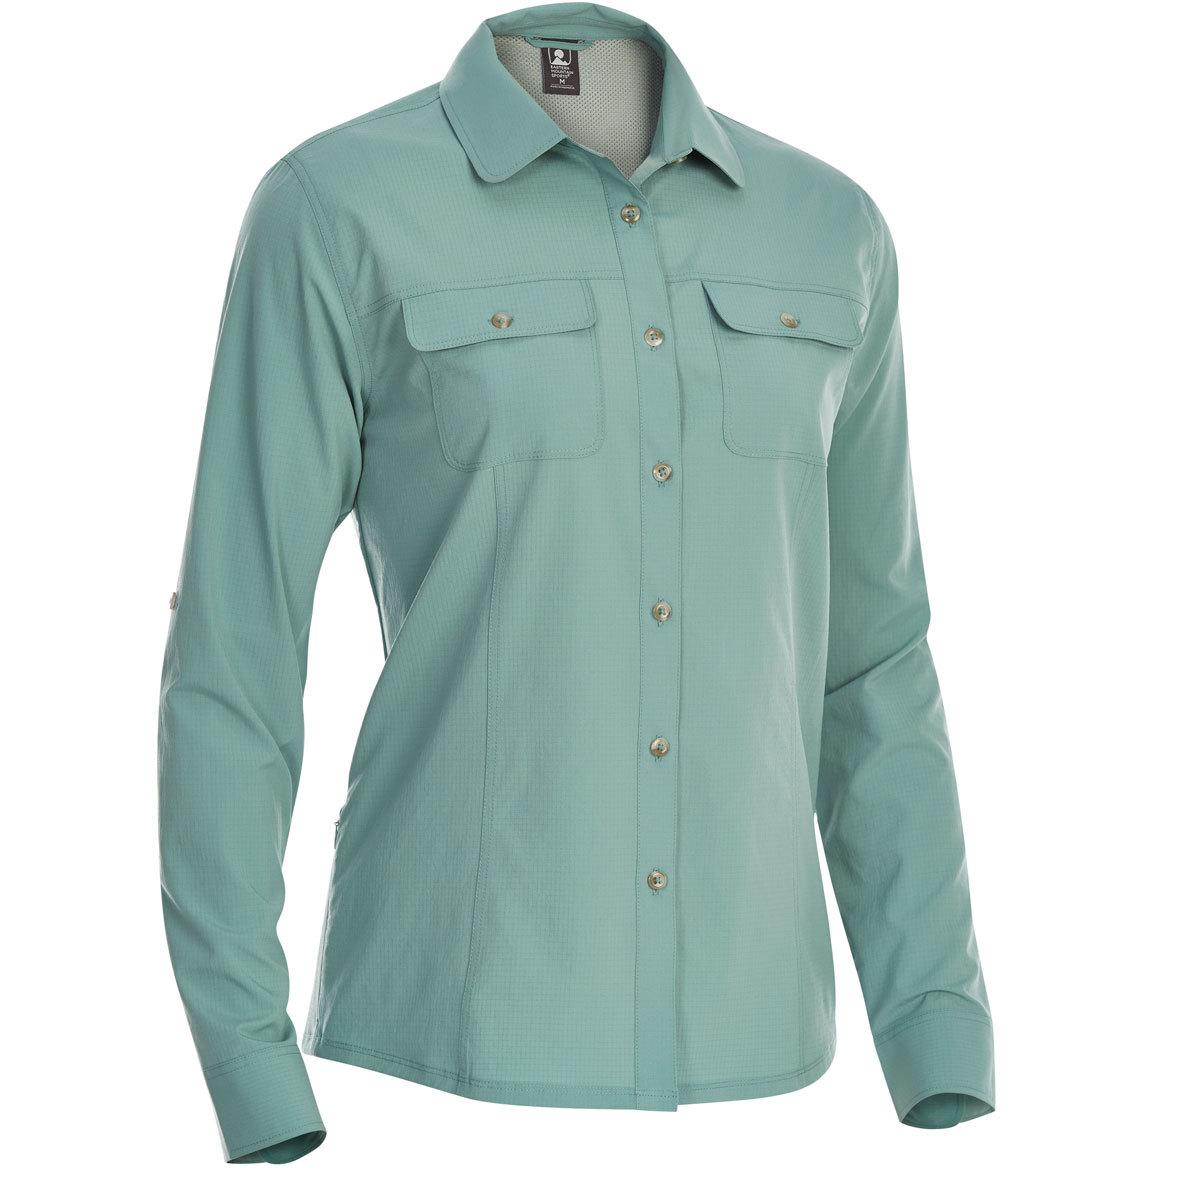 Ems Women's Techwick Traverse Upf Long-Sleeve Shirt - Blue, L